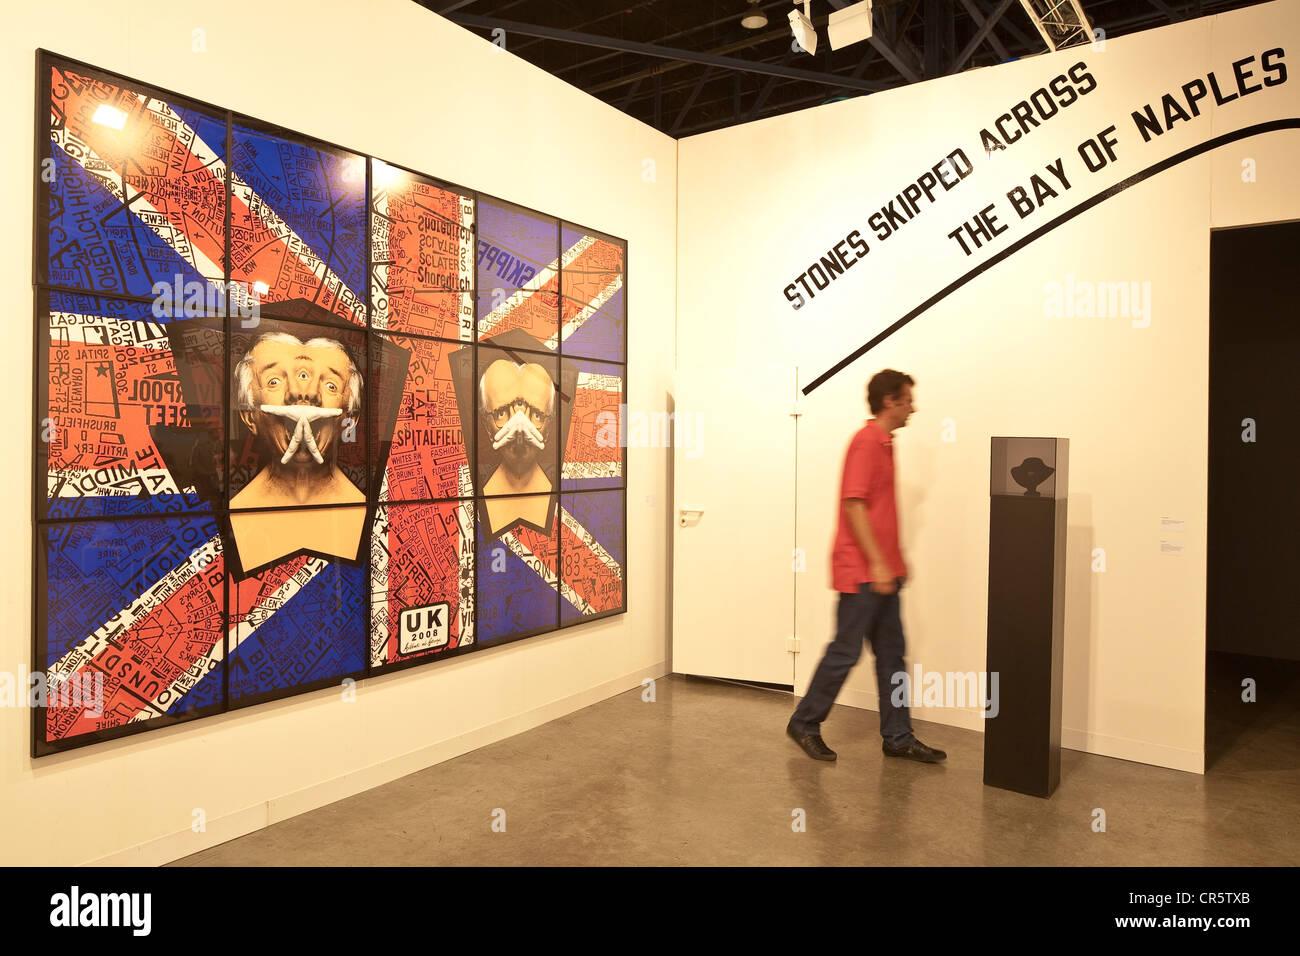 Art Basel Stockfotos & Art Basel Bilder - Alamy